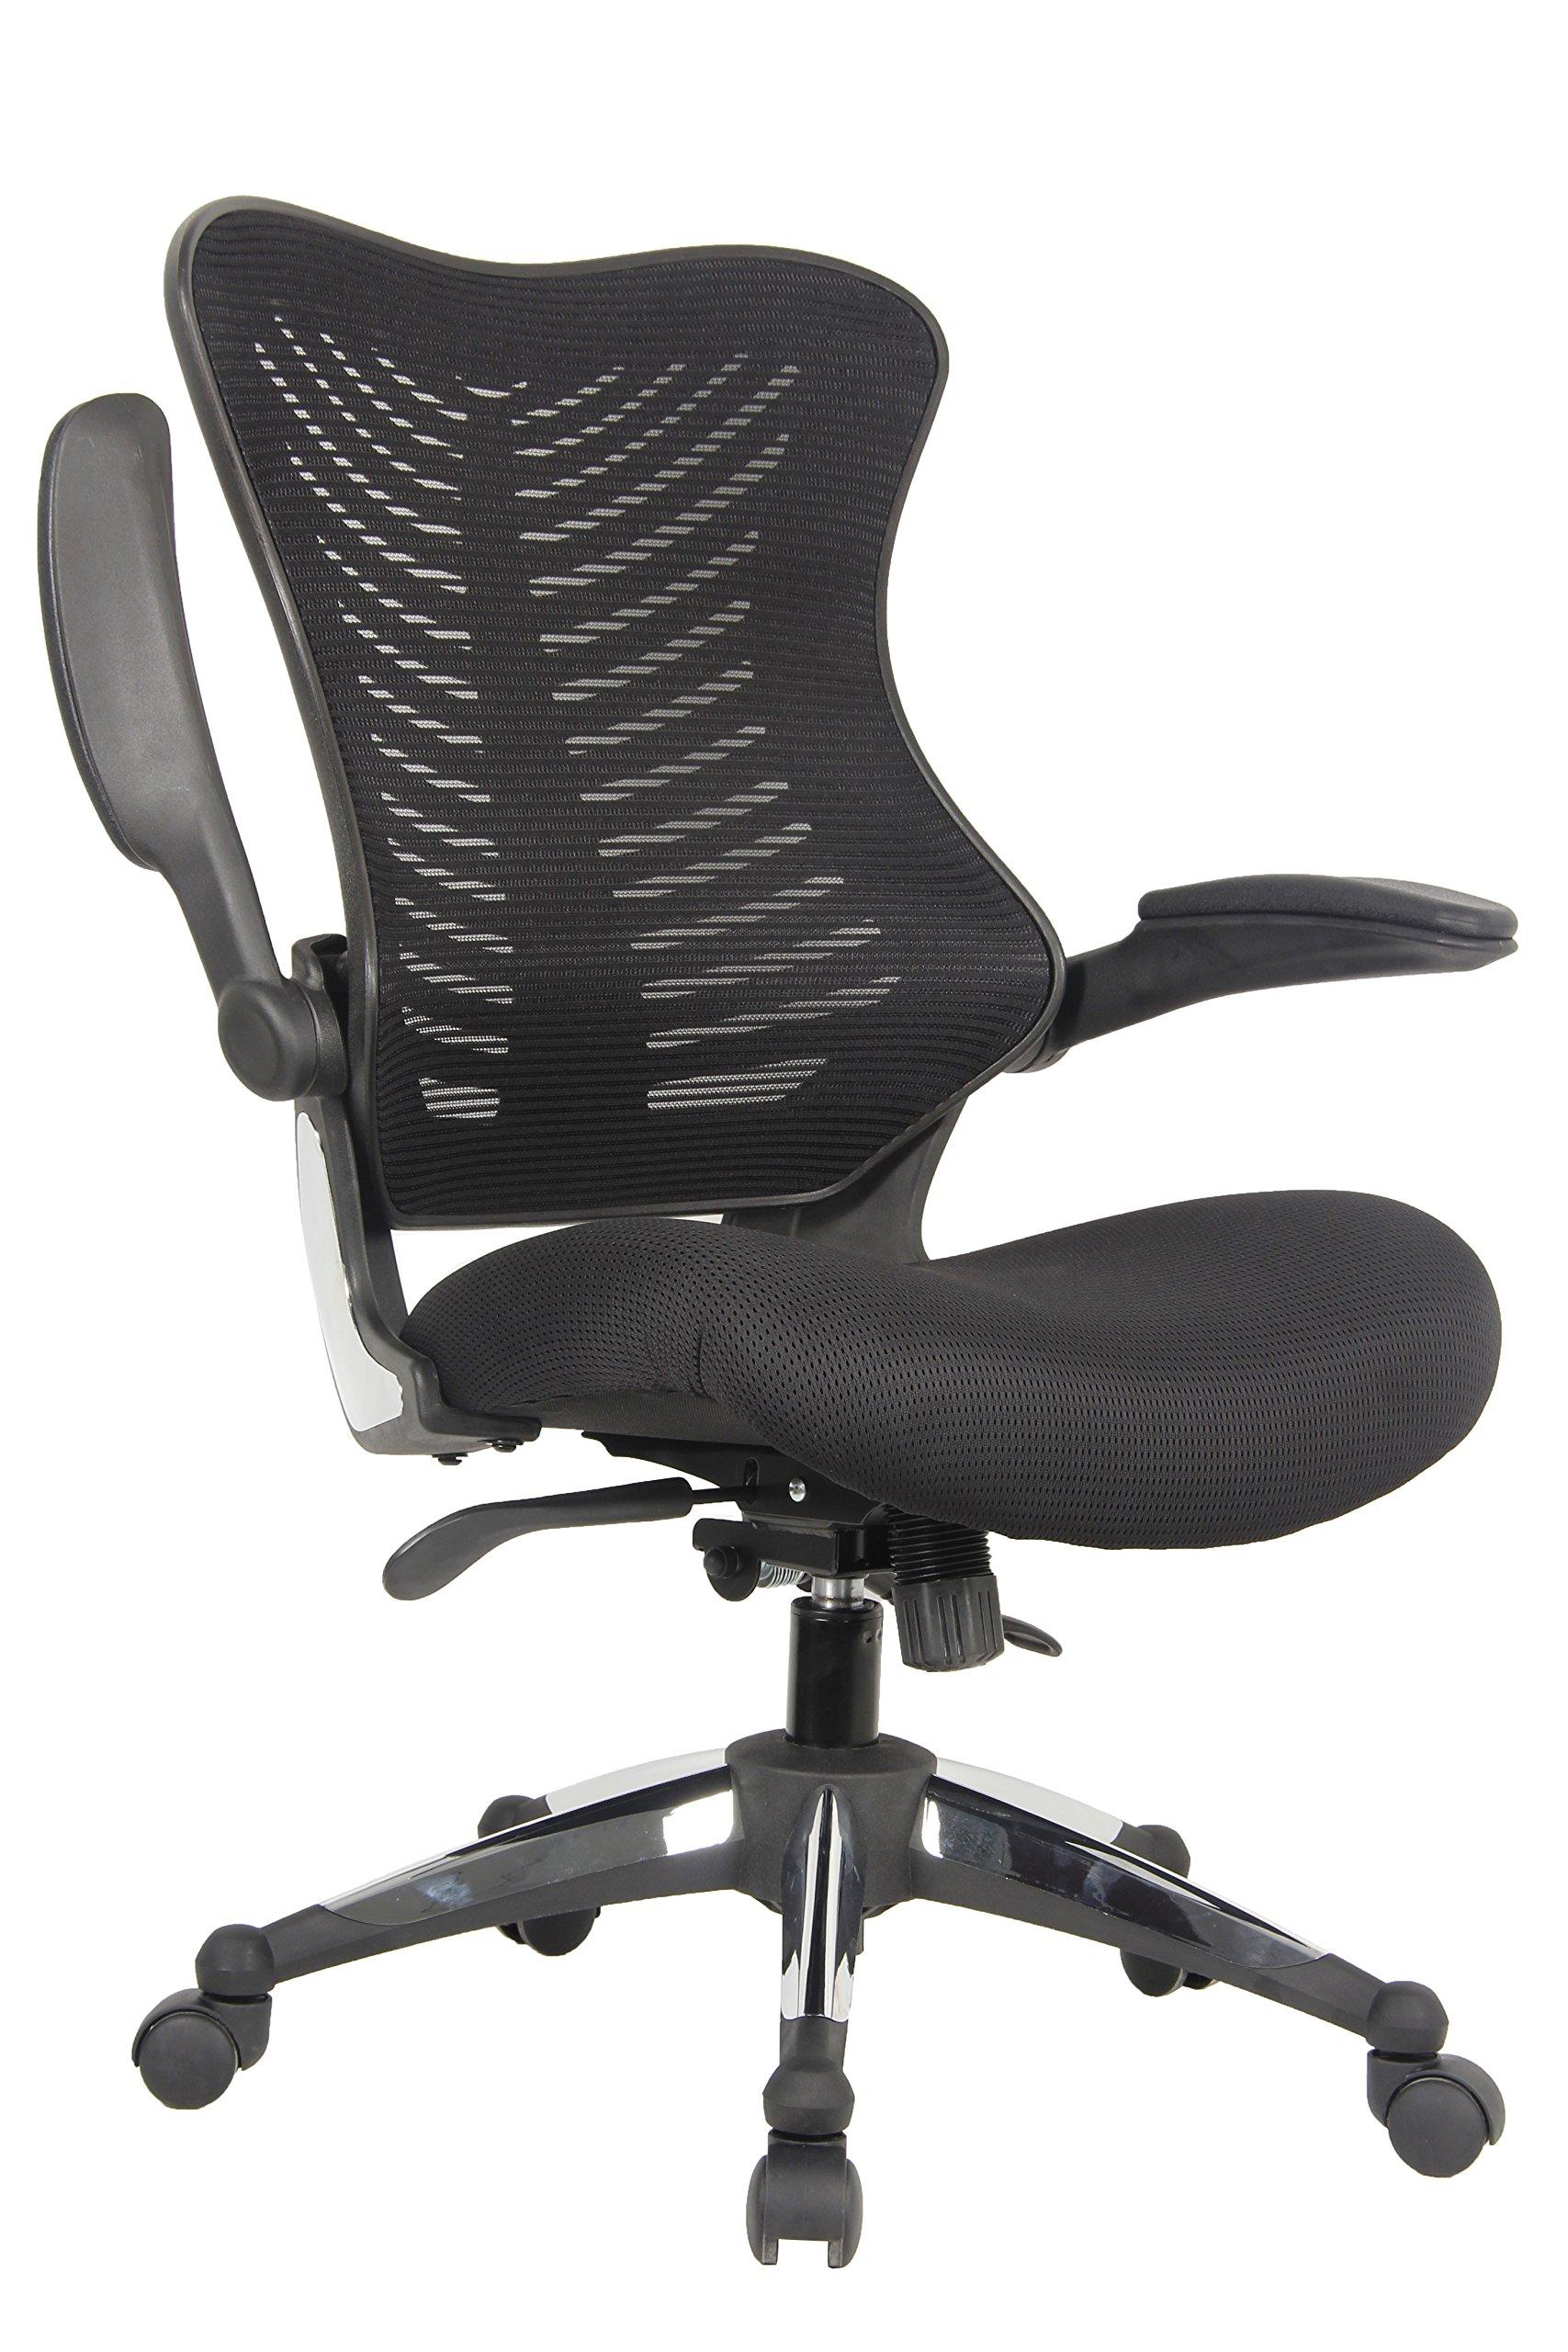 Buy Office Factor Bonded Leather Black Office Chair, Desk